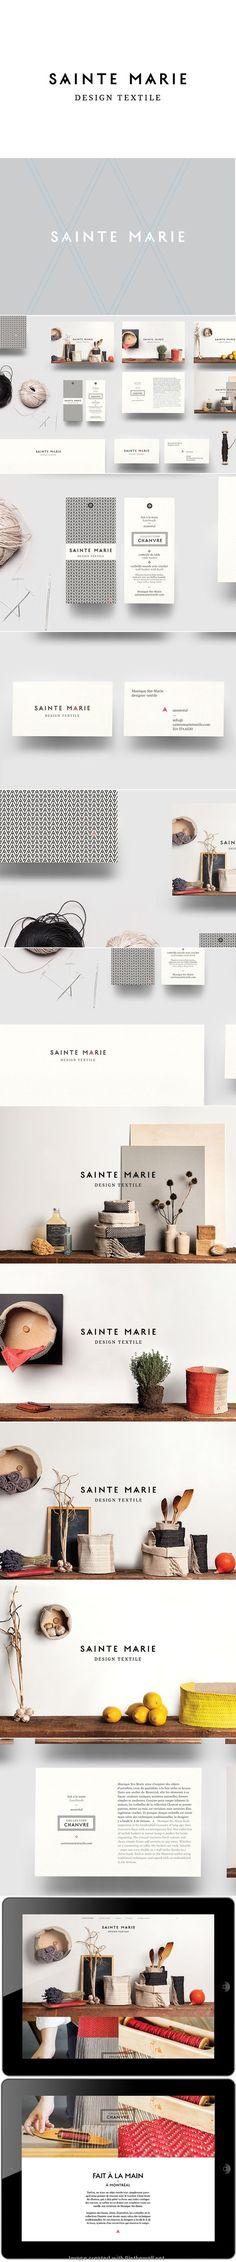 Sainte Marie - design textile brand design